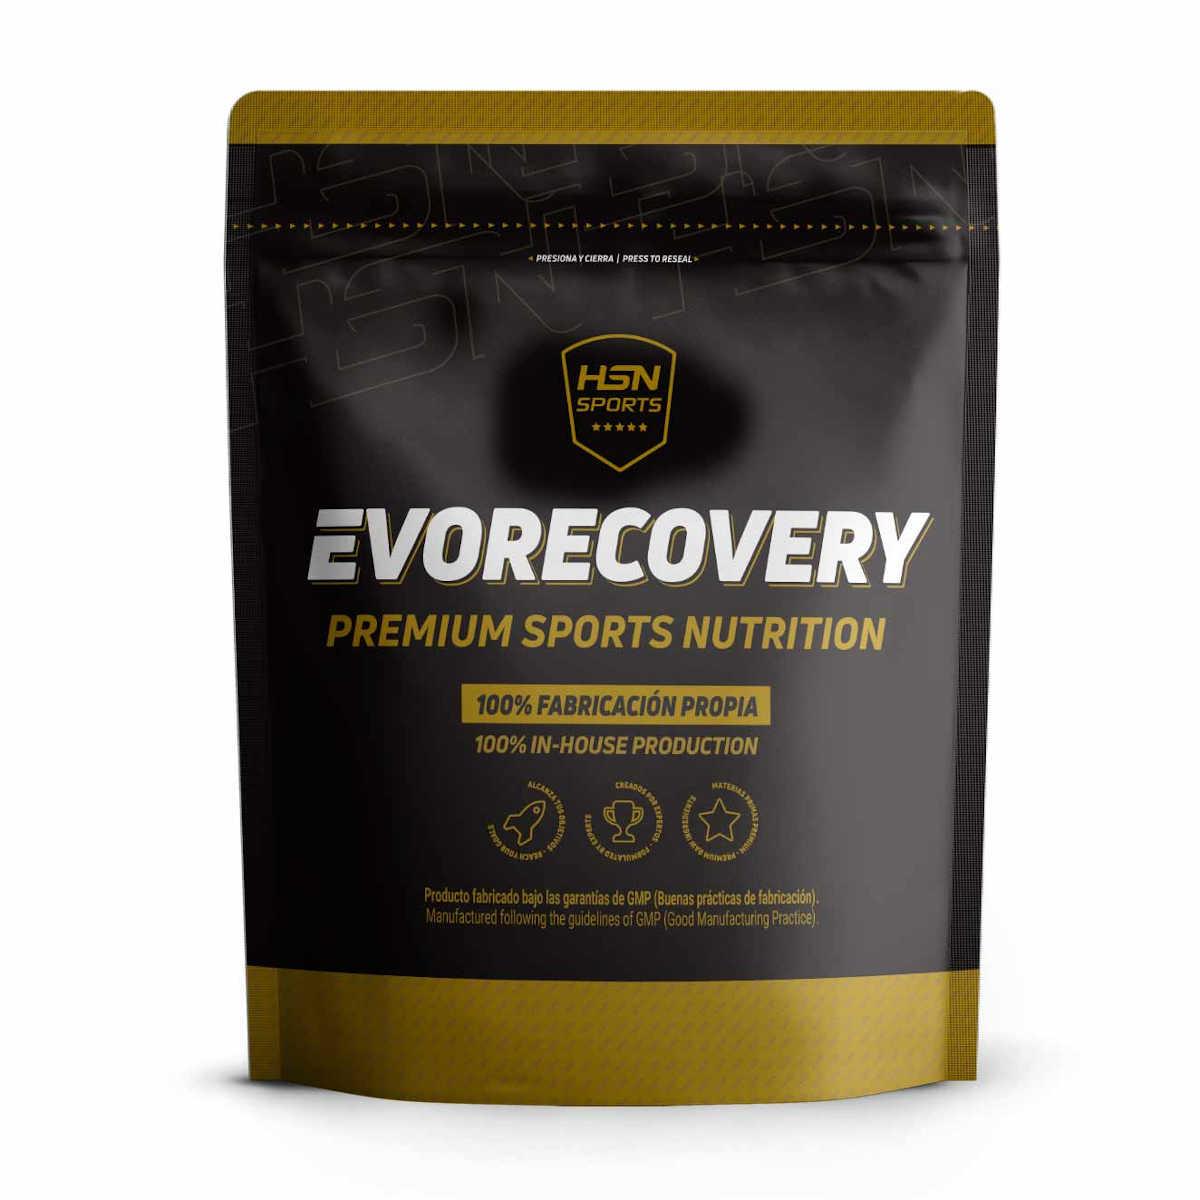 Evorecovery